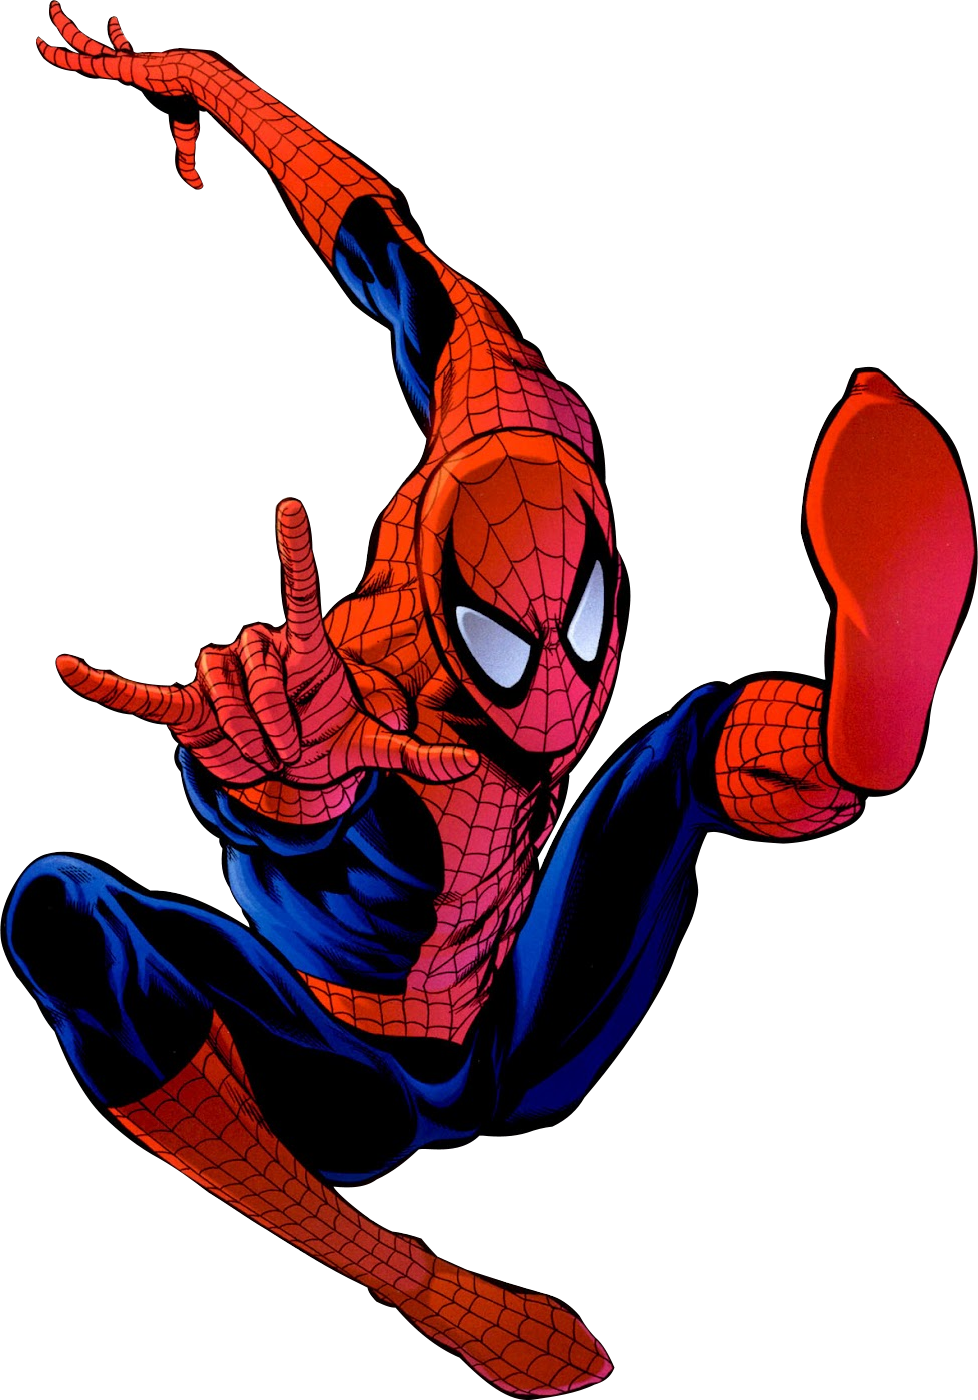 978x1400 Spider Man Spiderman, Spider Man And Spider